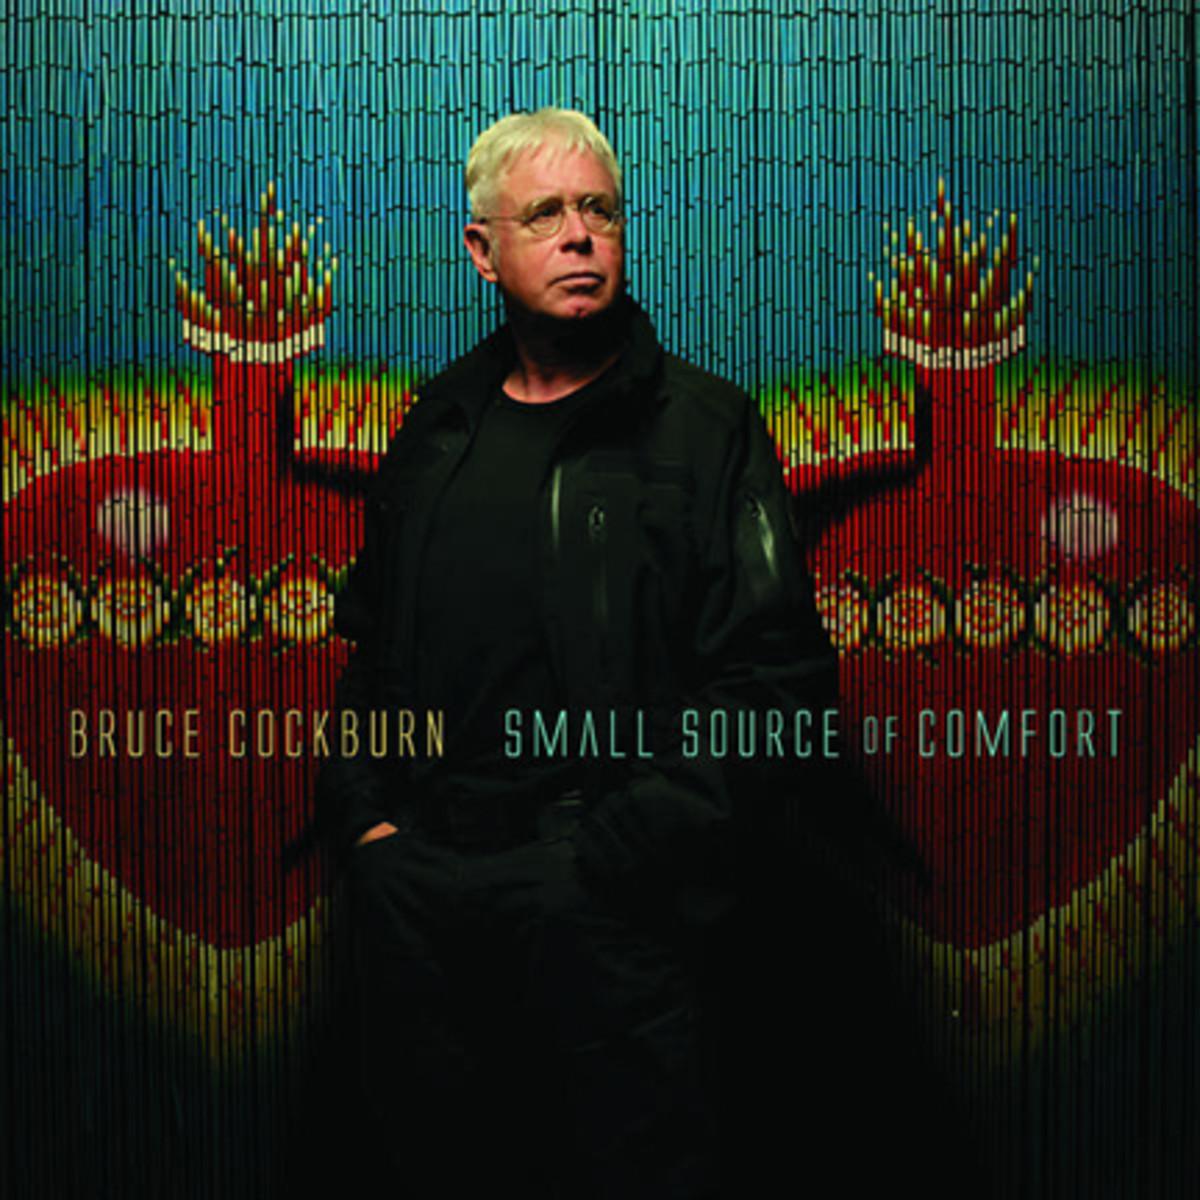 Bruce Cockburn Small Source of Comfort